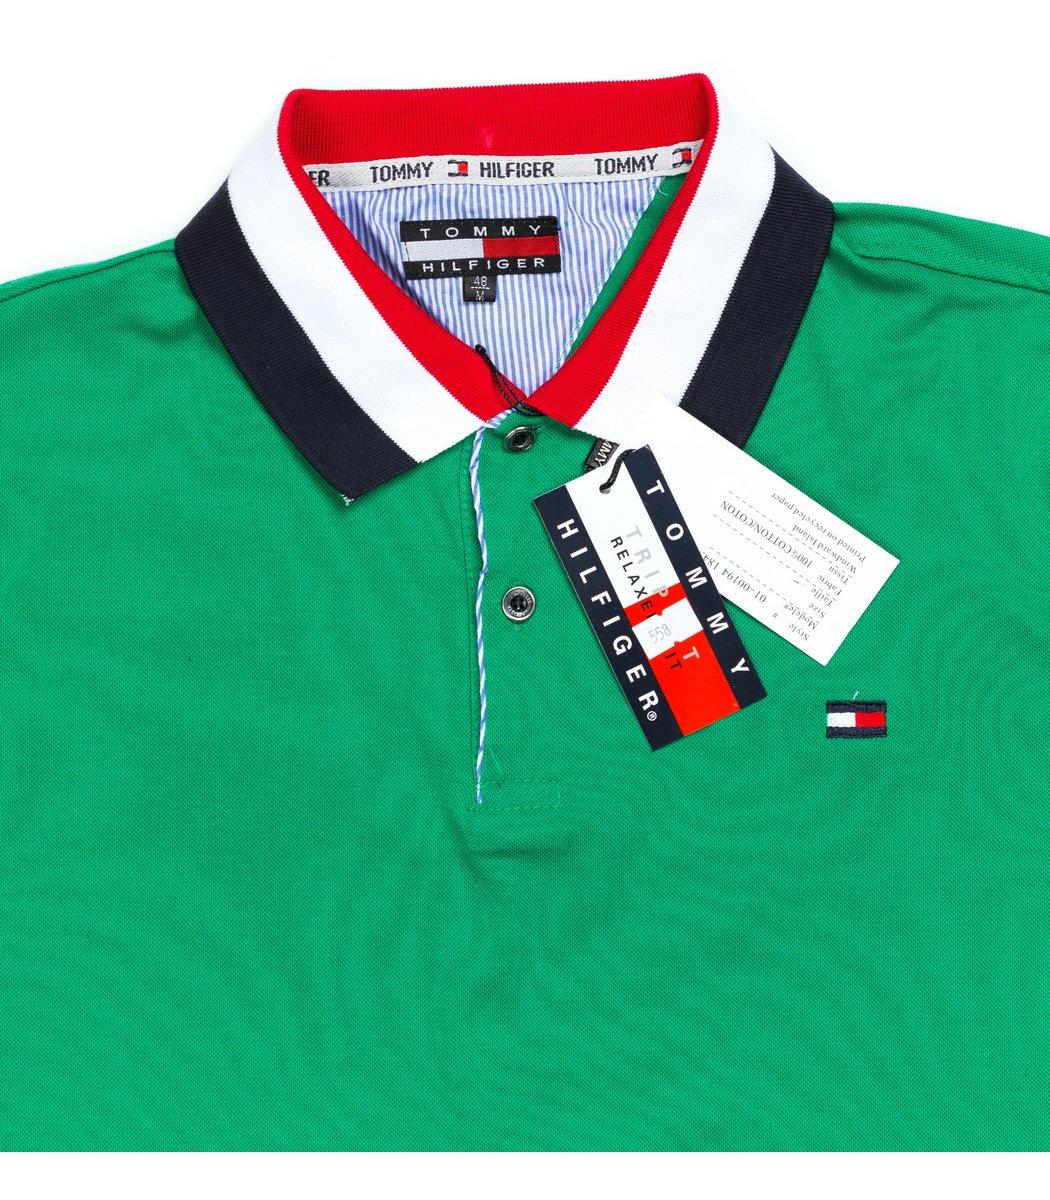 Мужская зеленая футболка поло Tommy Hilfige - зеленый - Вид 4